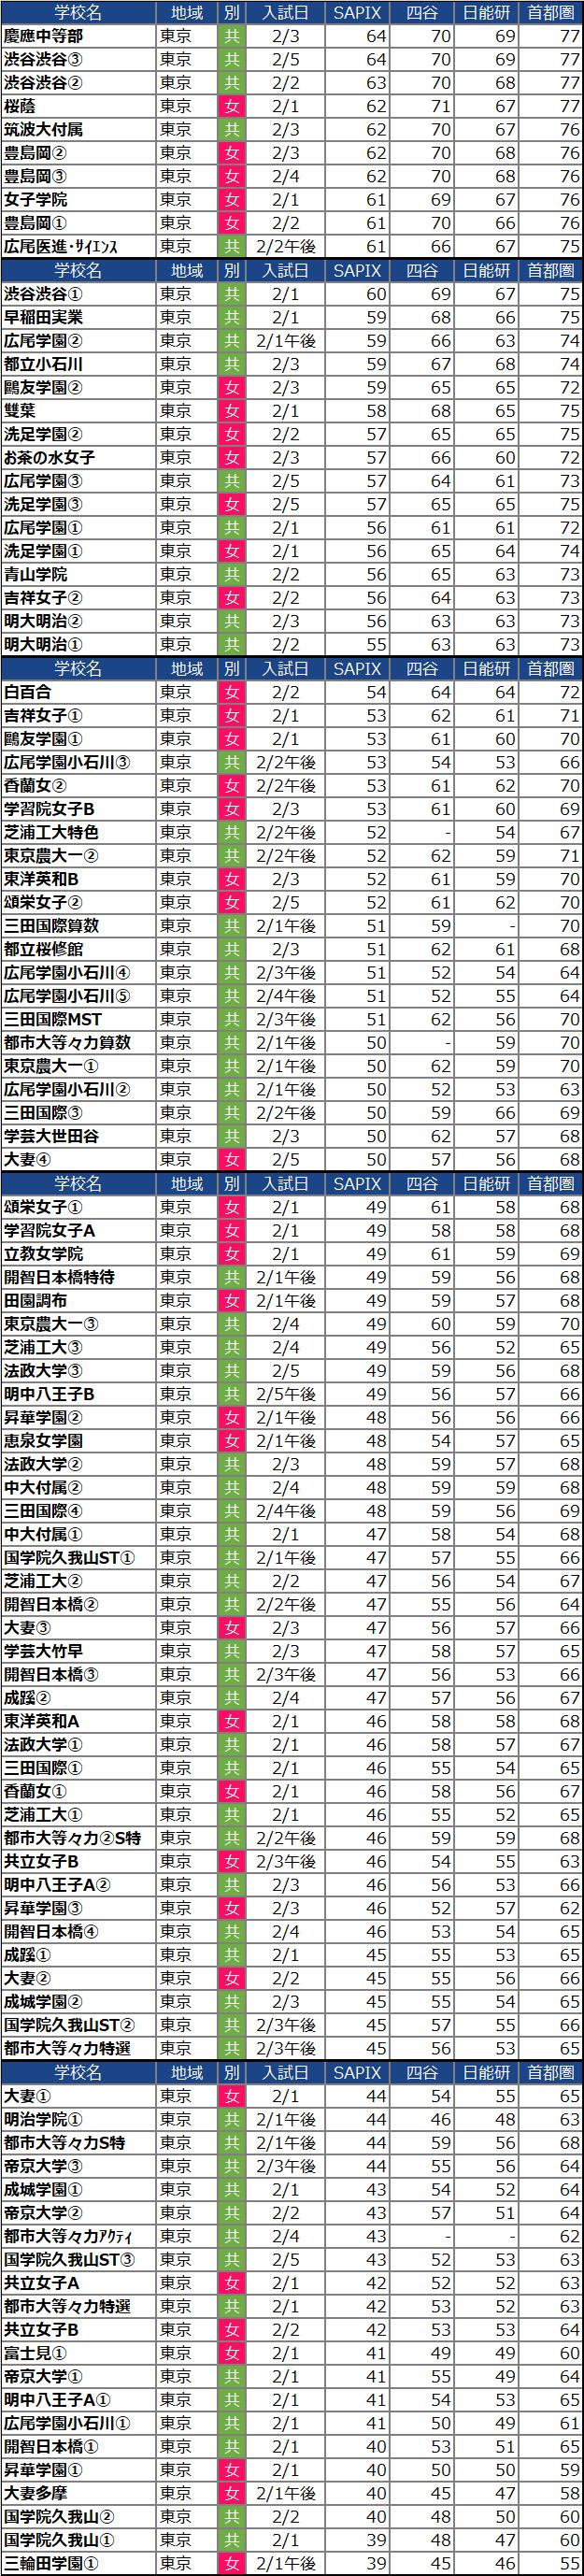 【中学受験2022】東京の中学校の偏差値ランキング(SAPIX・四谷大塚・日能研・首都模試)女子